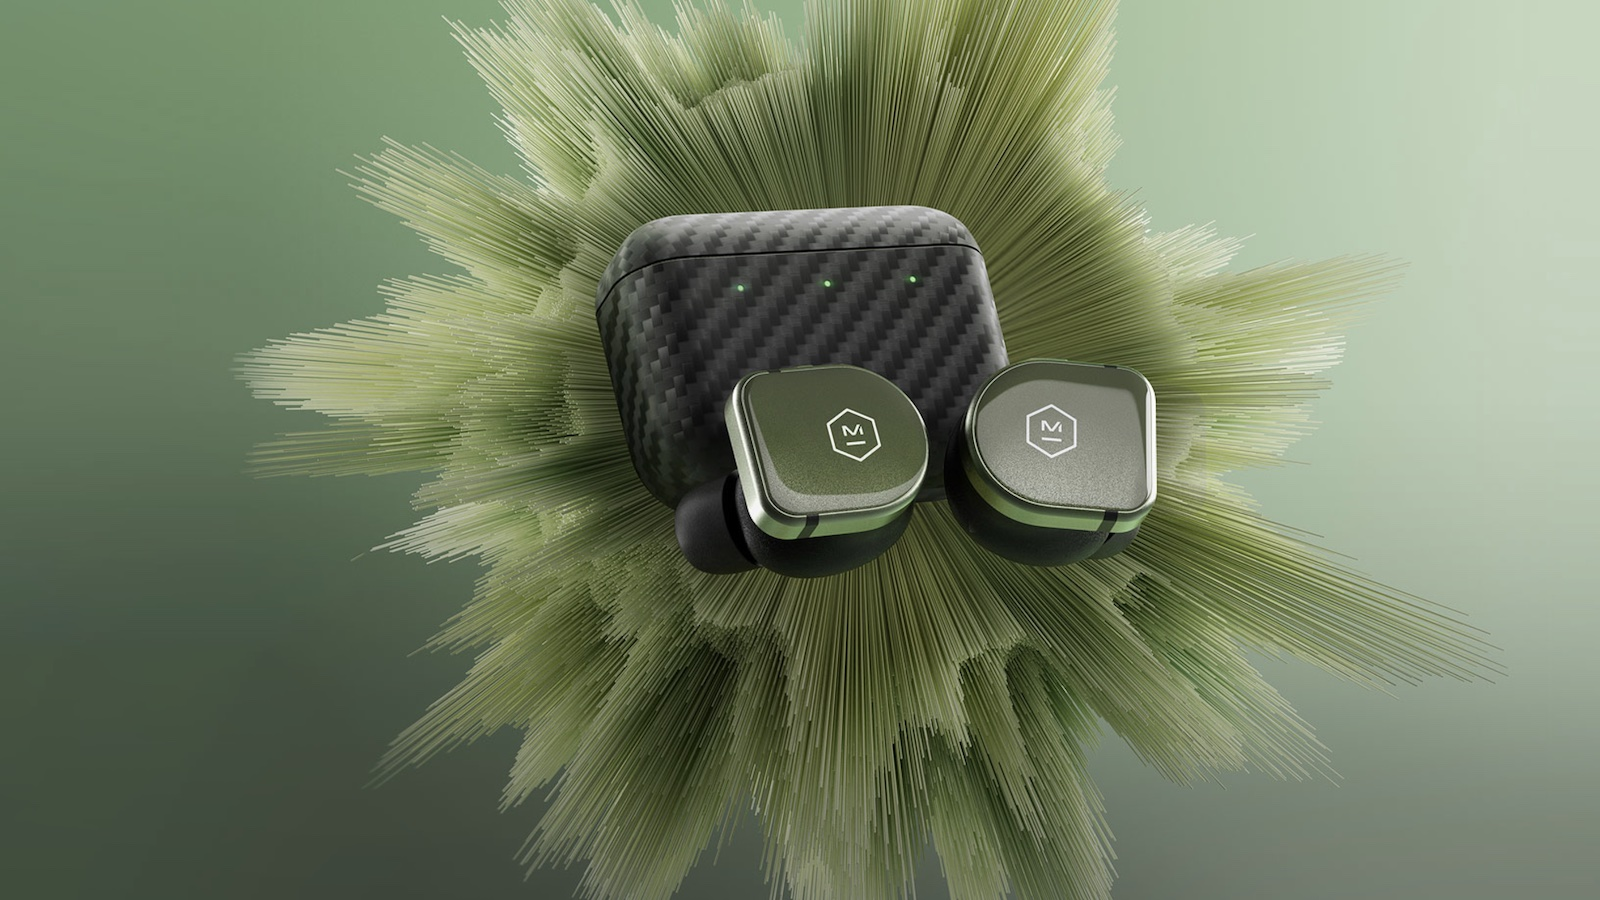 Master & Dynamic MW08 Sport noise-canceling earphones feature durable sapphire glass